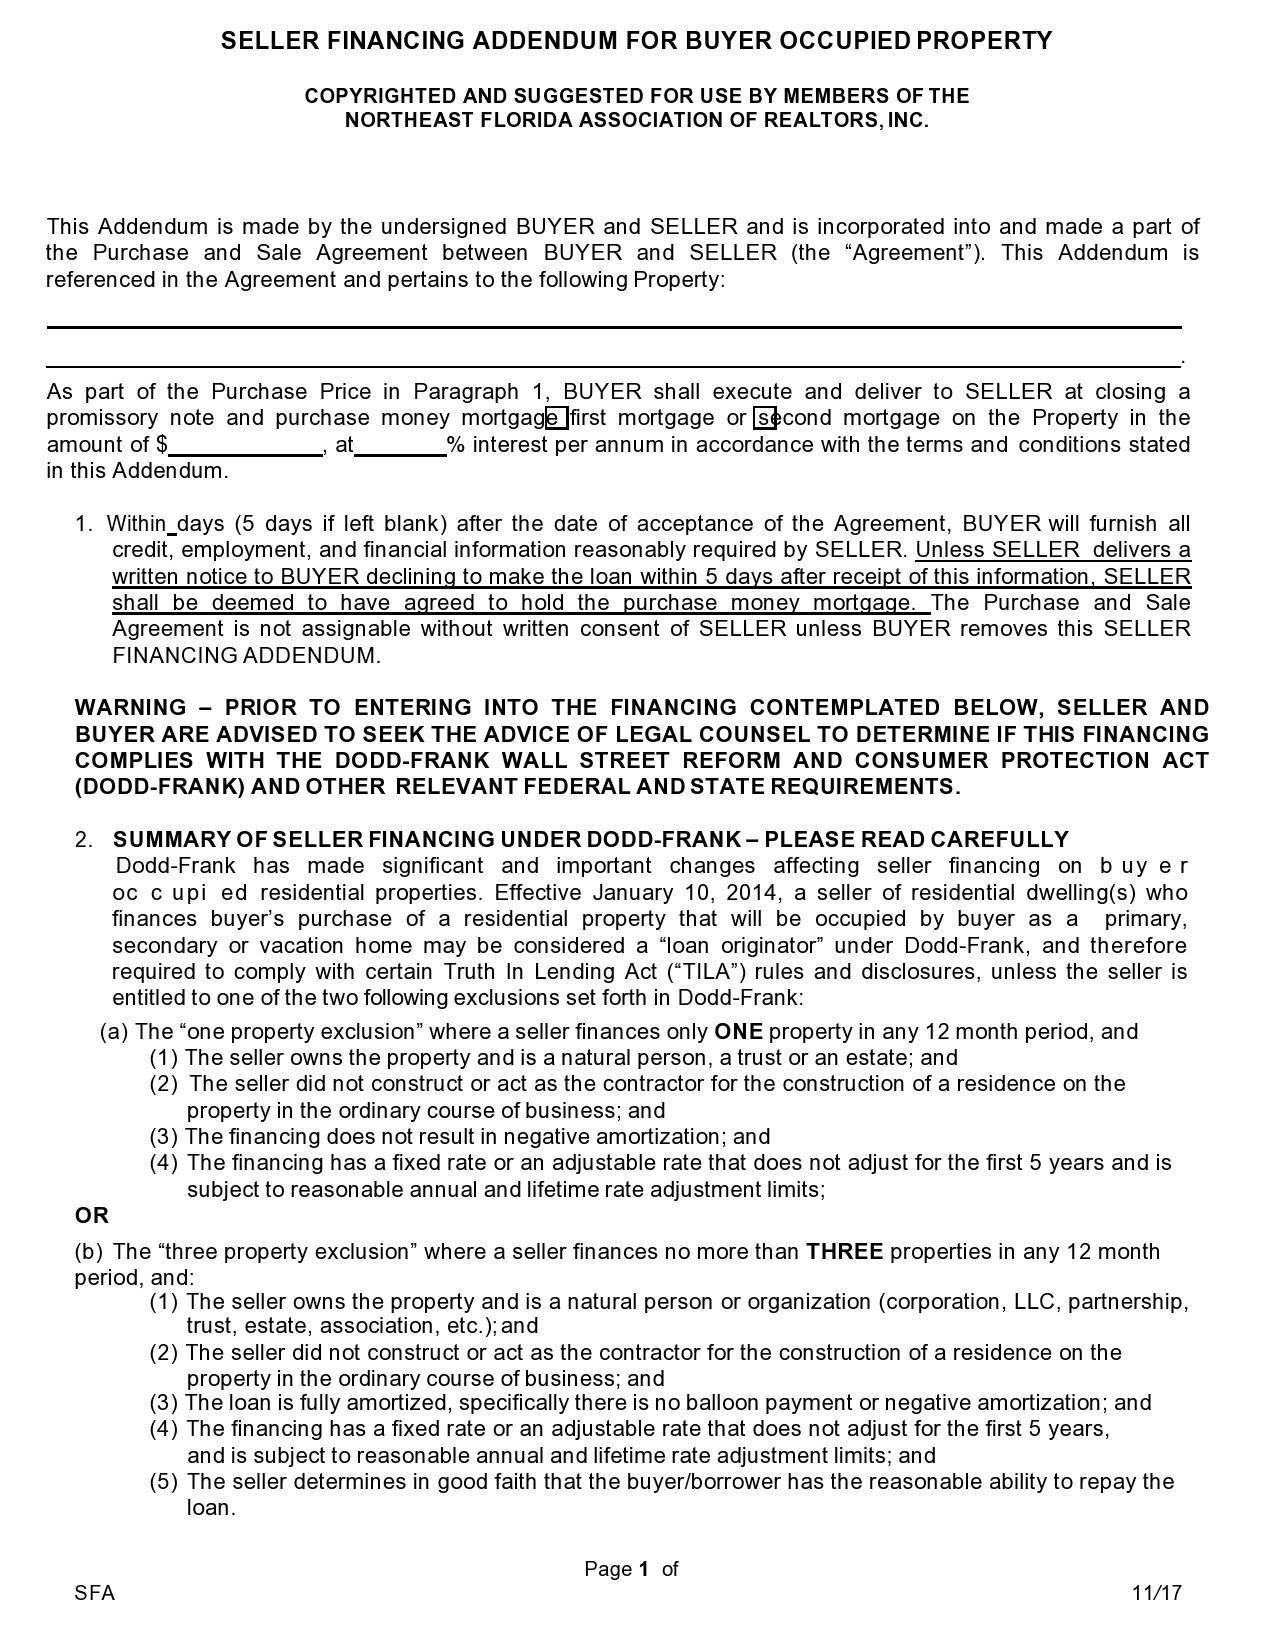 Free seller financing addendum 03